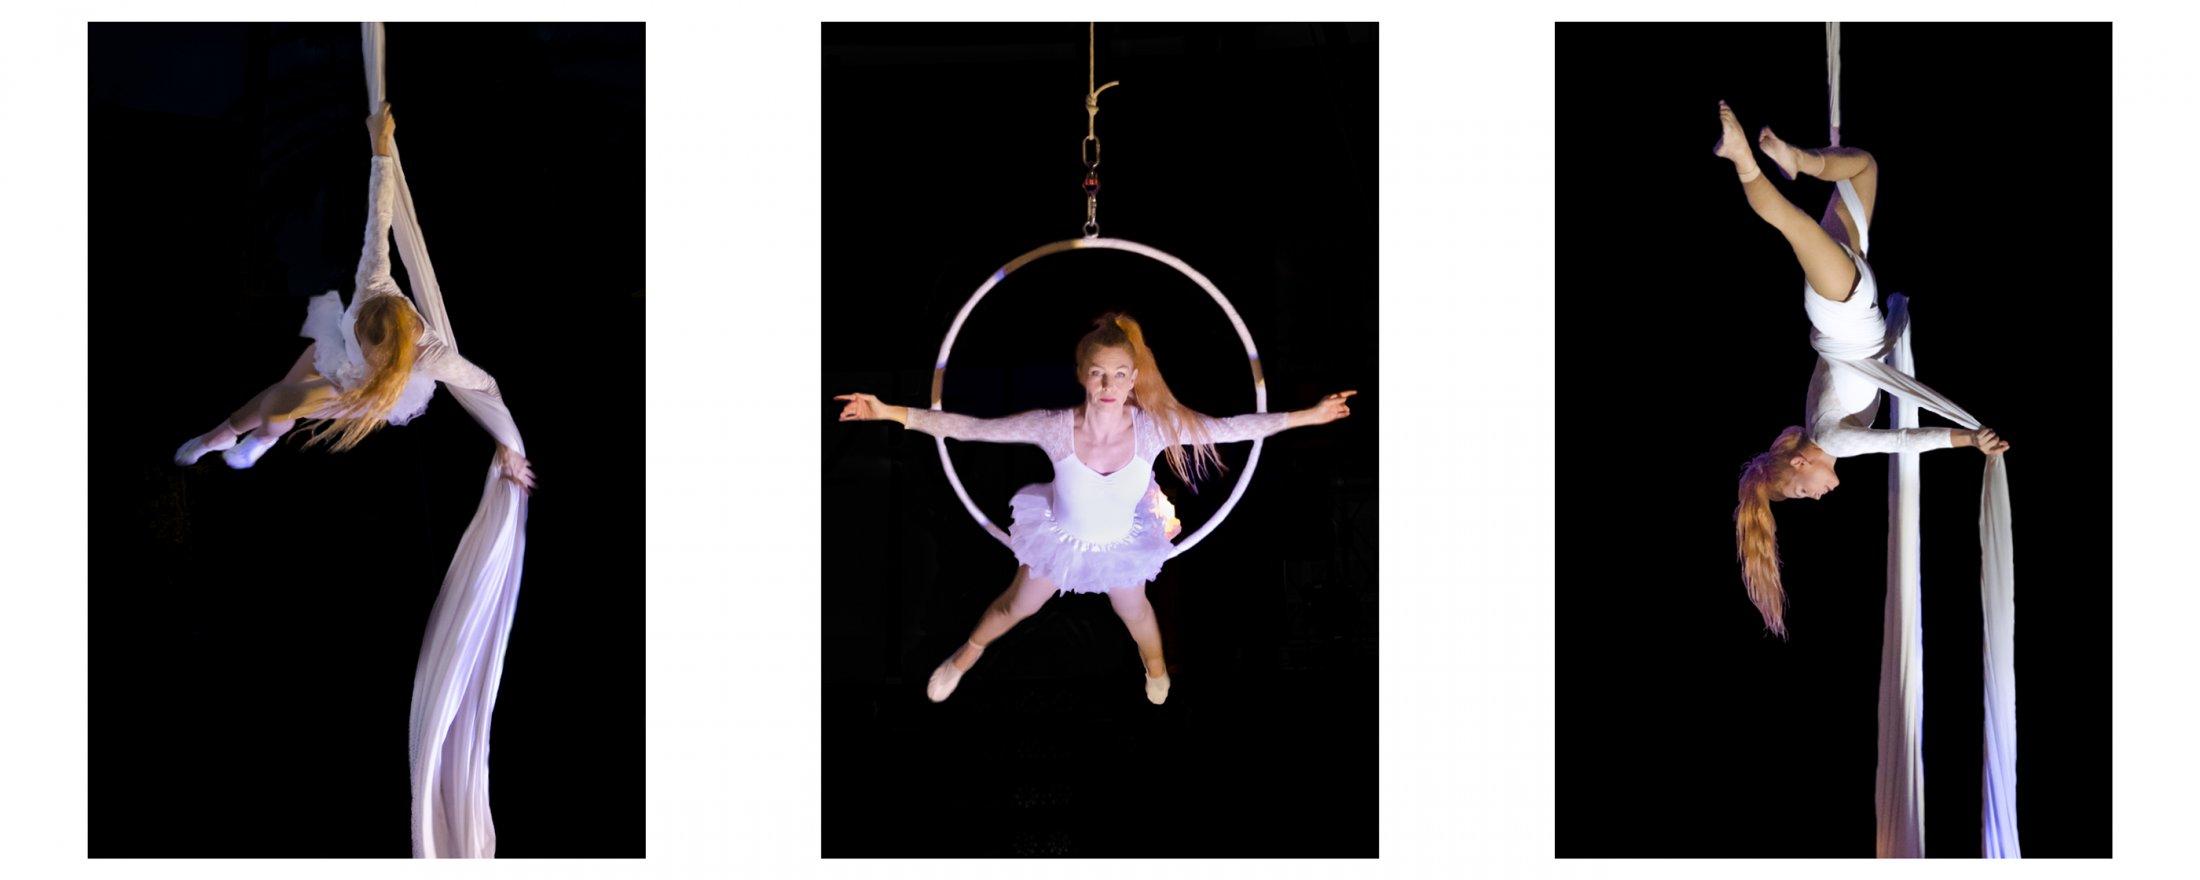 062-Danza Aerea